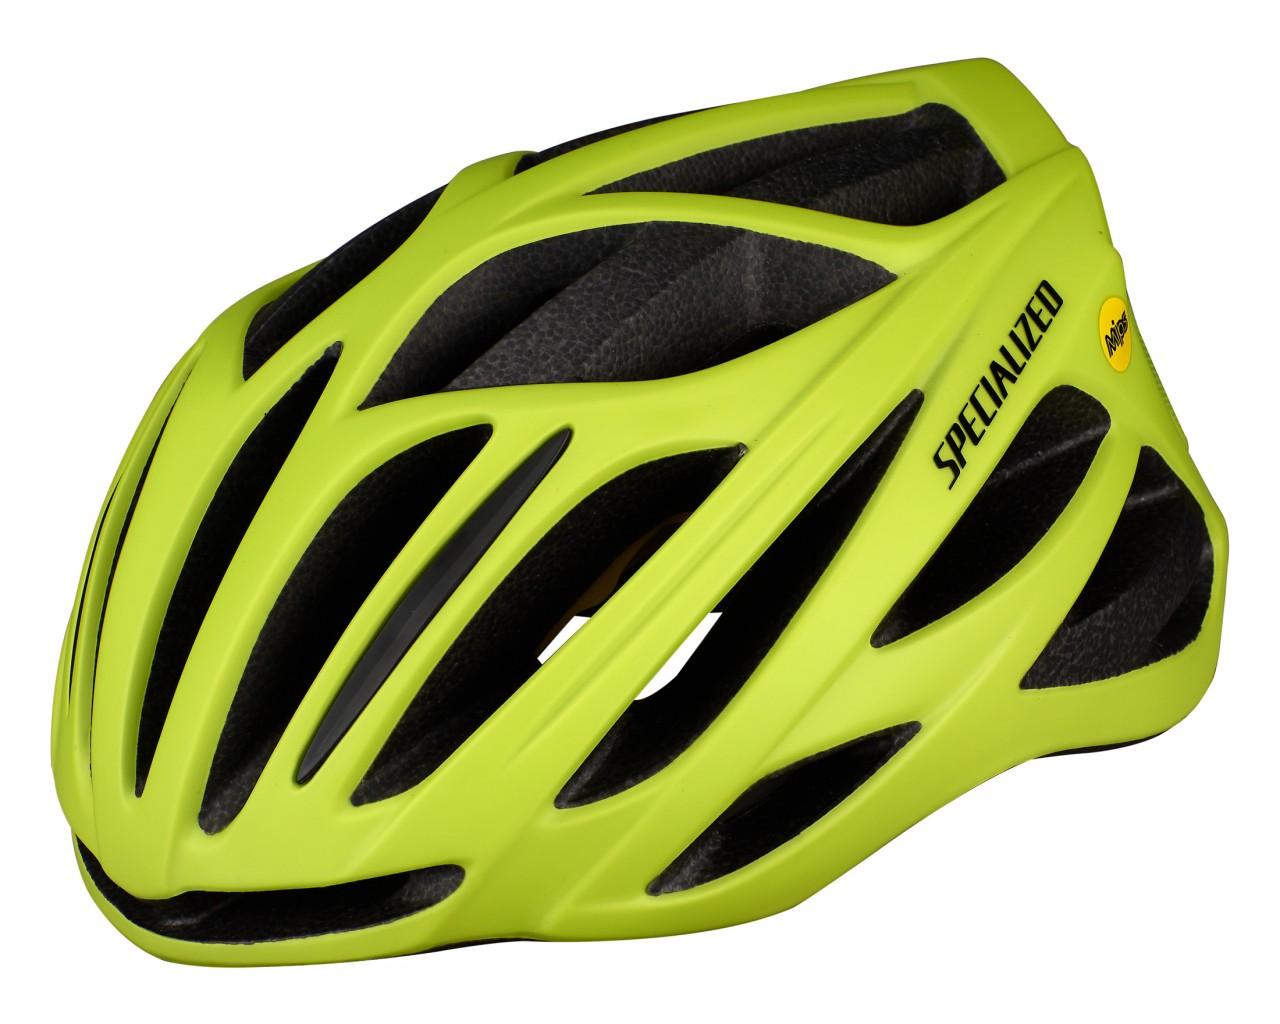 Specialized Echelon II MIPS Rennrad Fahrradhelm | hyper green